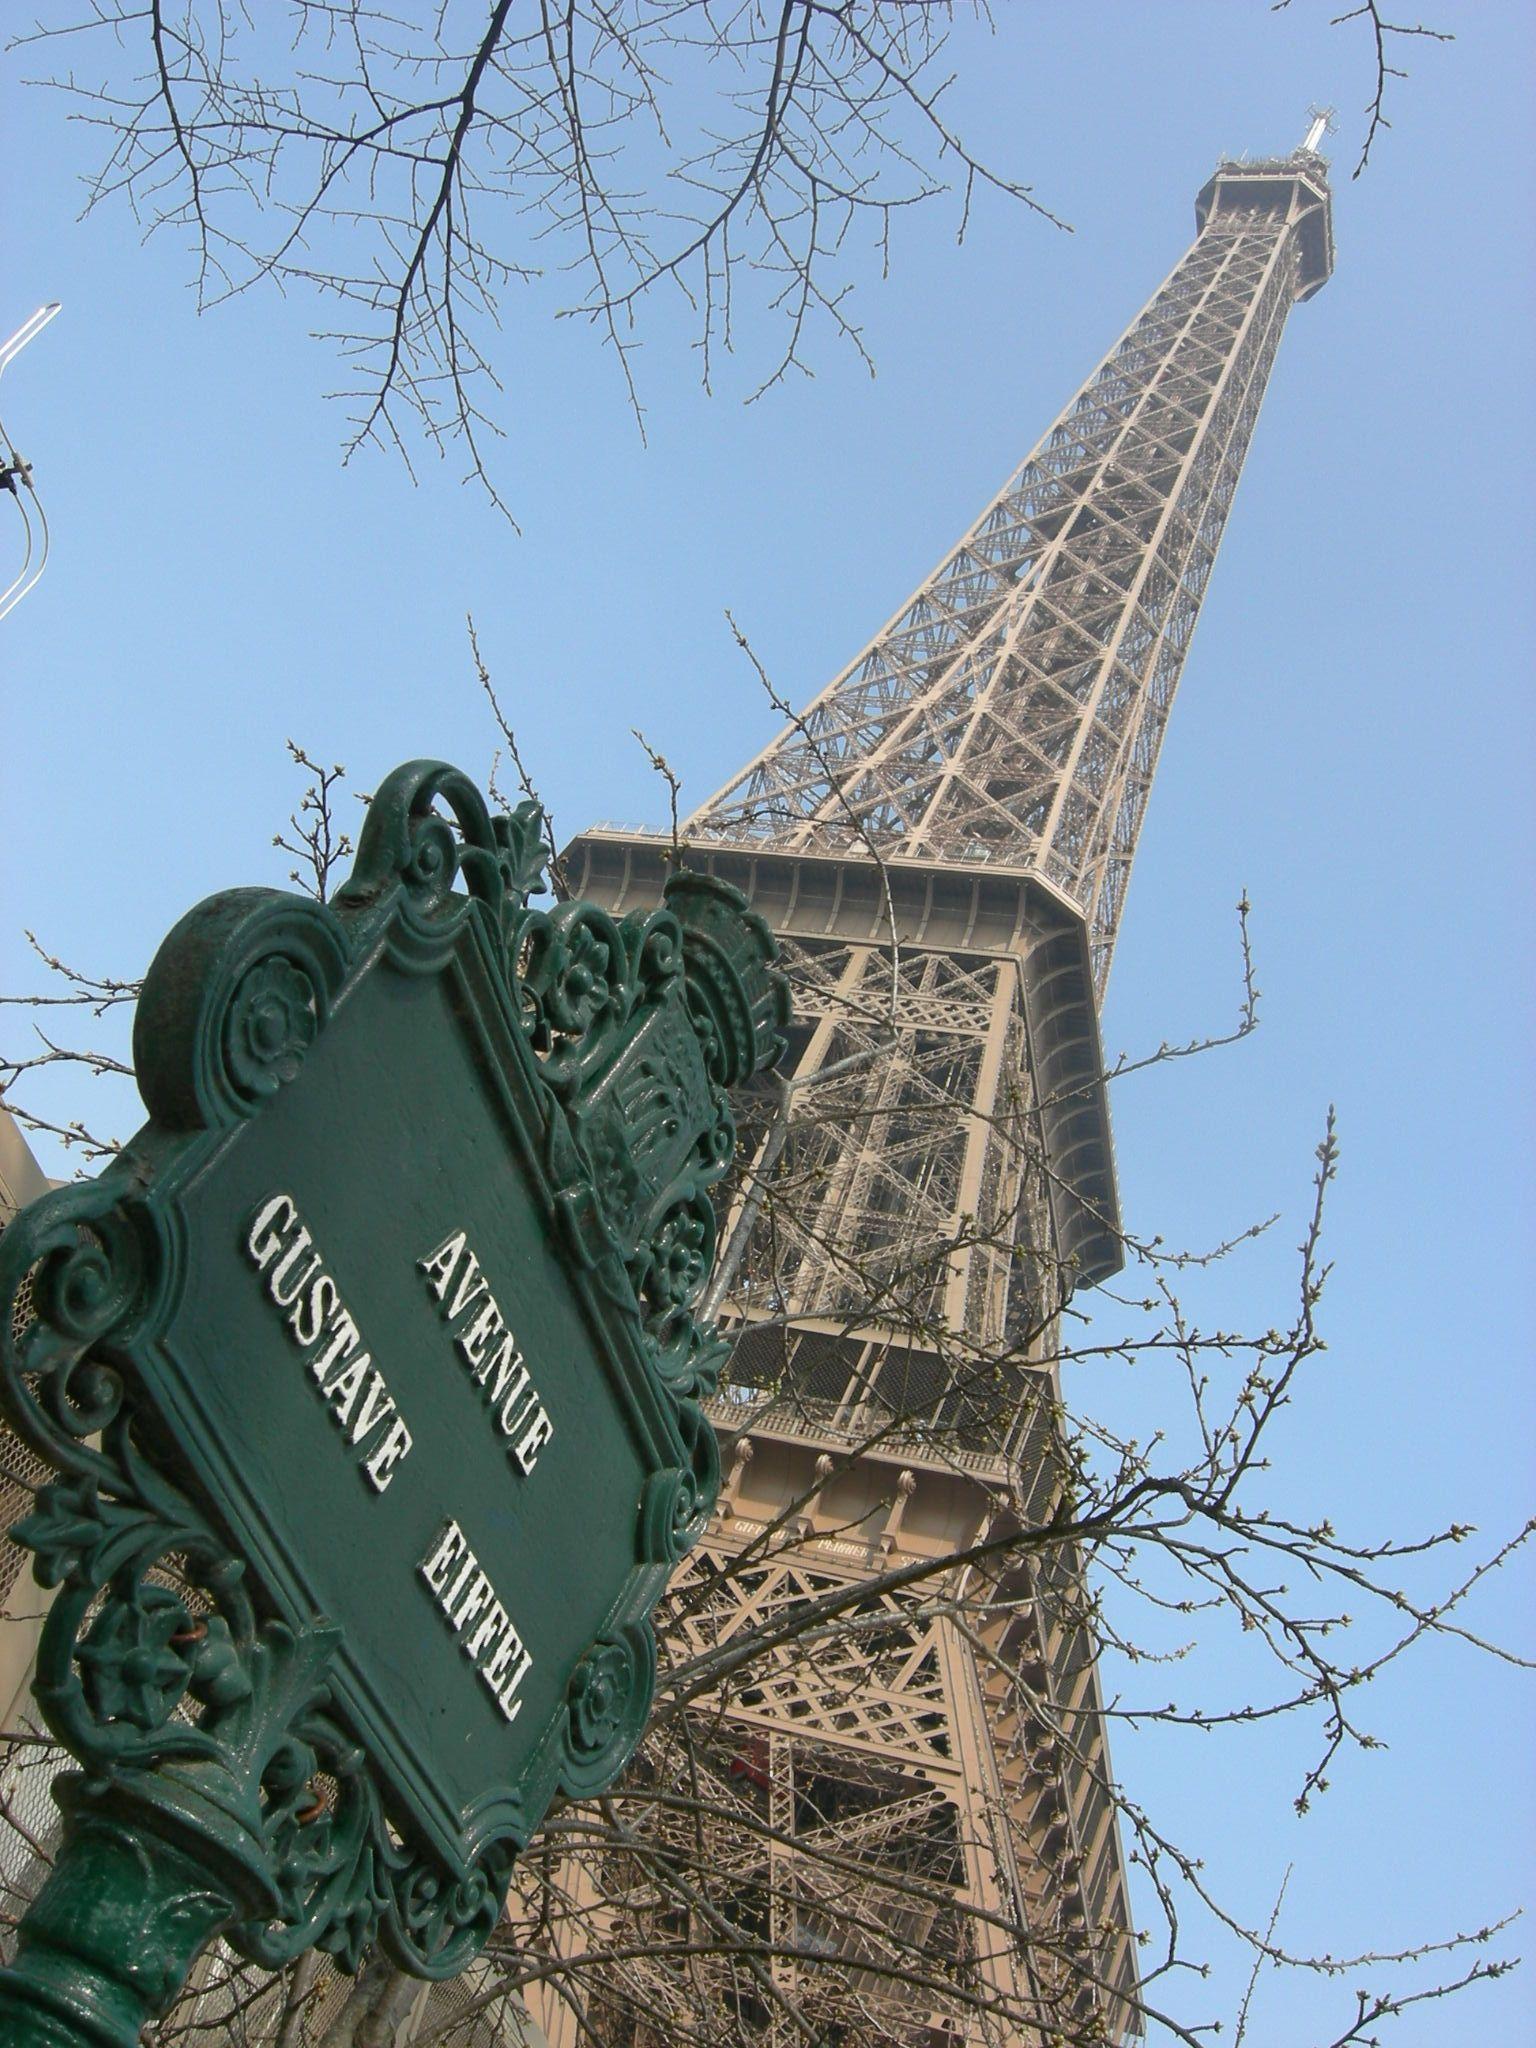 Gros Caillou Quarter, Eiffel Tower, avenue Gustave Eiffel, Paris VII